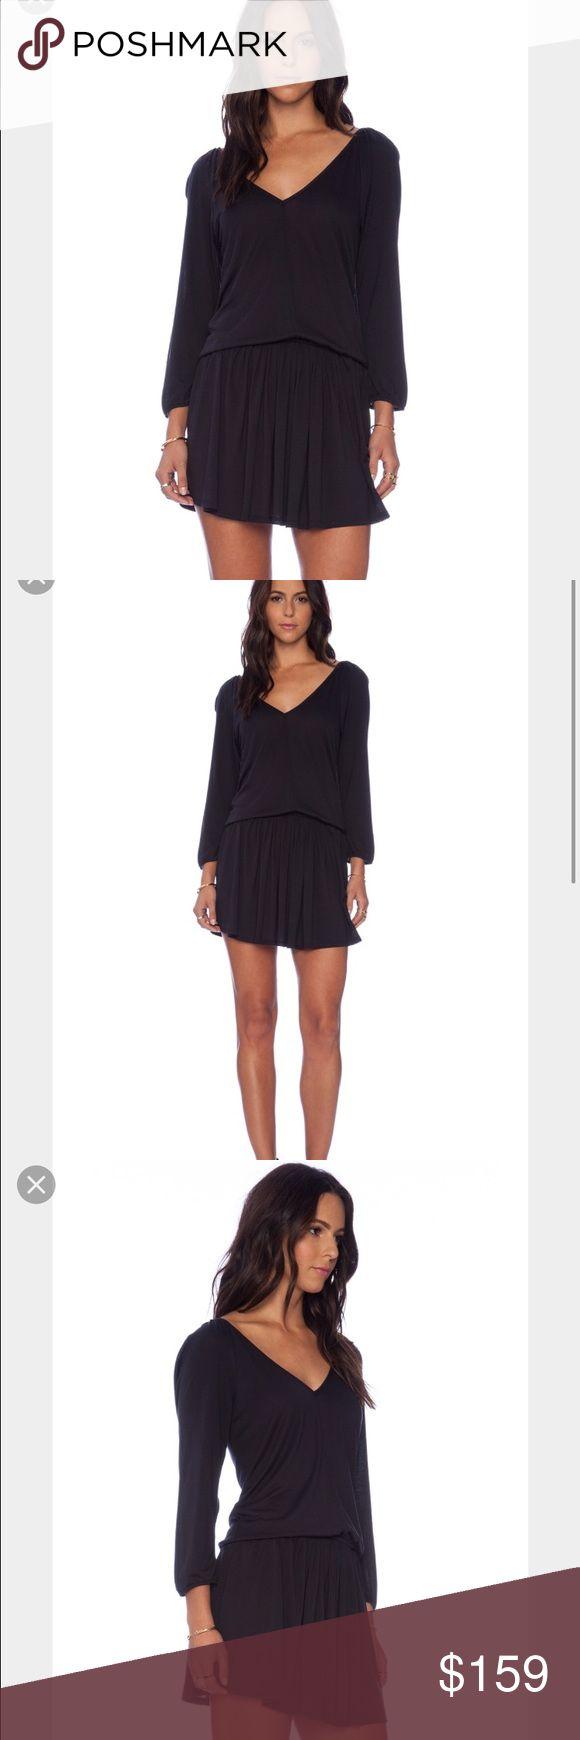 "Soft joie dress Brand new!  100% viscose black dress, elastic waistband, shoulder seam to  hem 35"" Joie Dresses Mini"